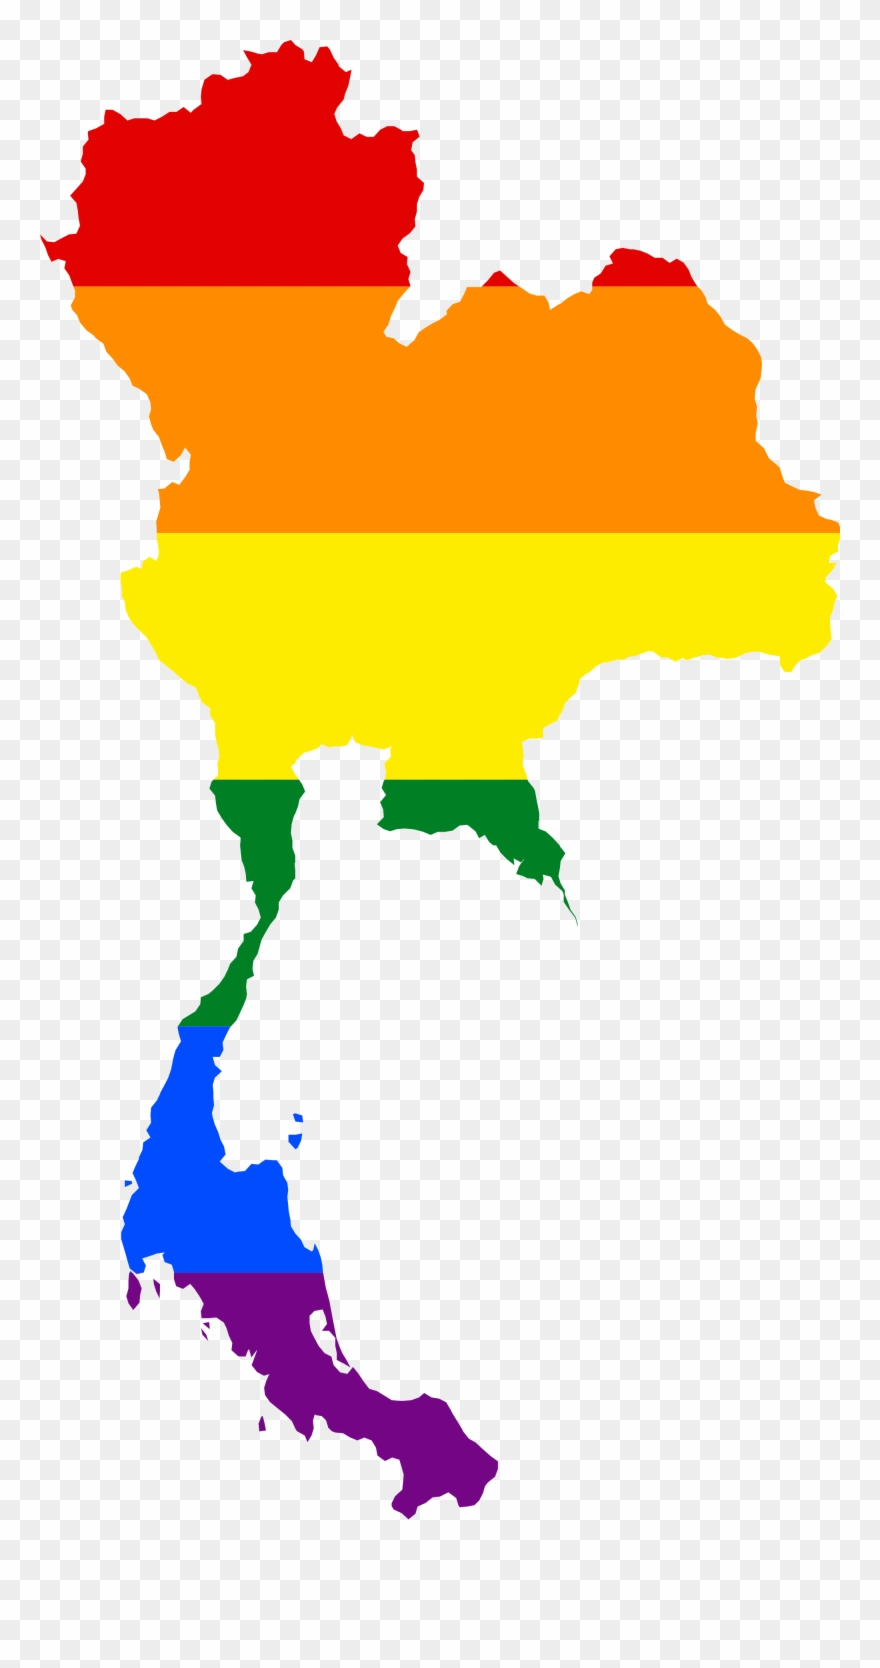 Transparent Lgbt Vector Jpg Transparent Download Thailand Map